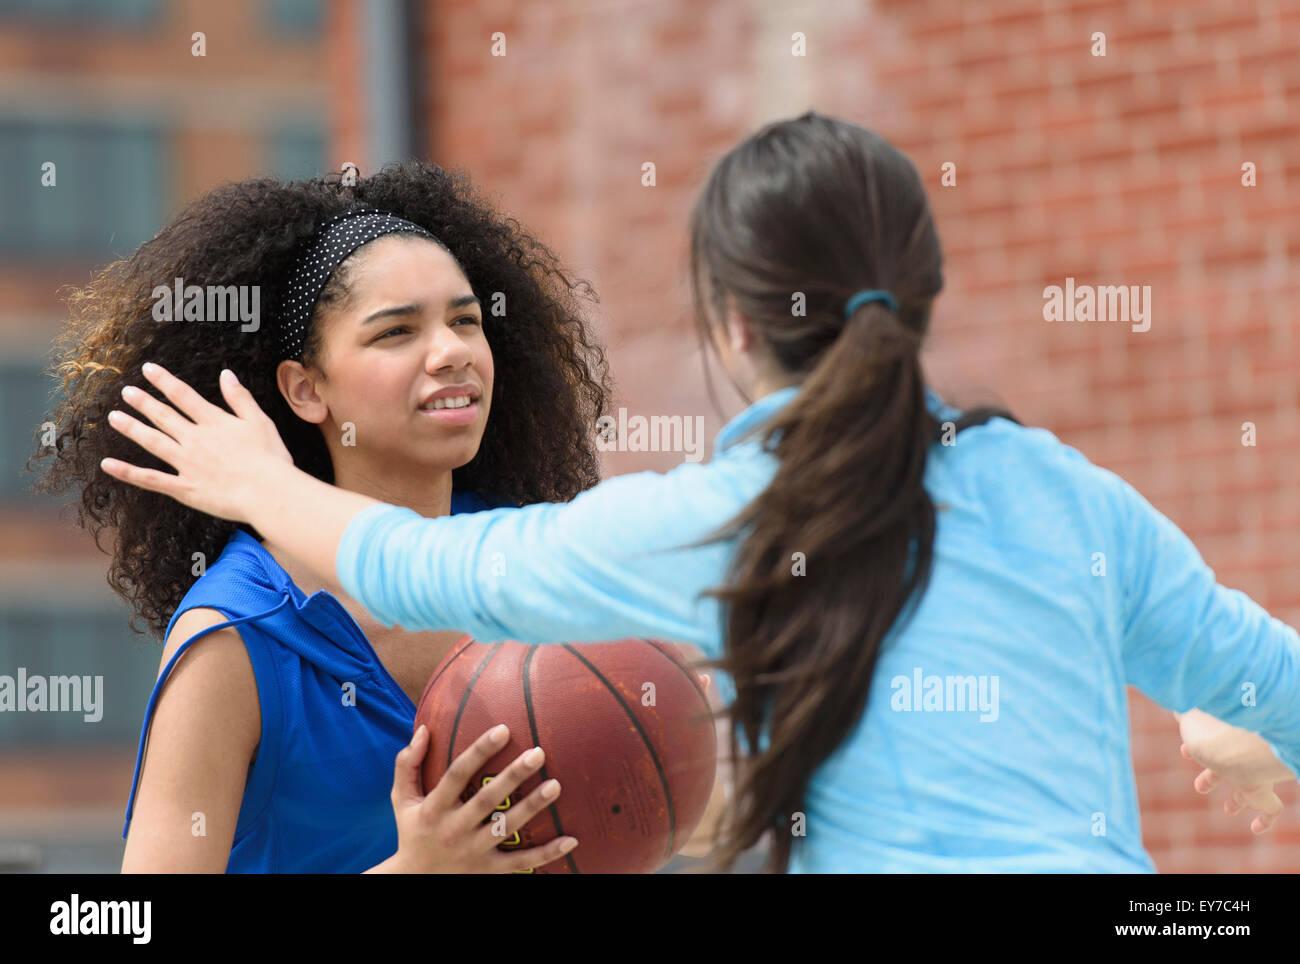 Adolescentes (14-15, 16-17) jouant au basket-ball Photo Stock